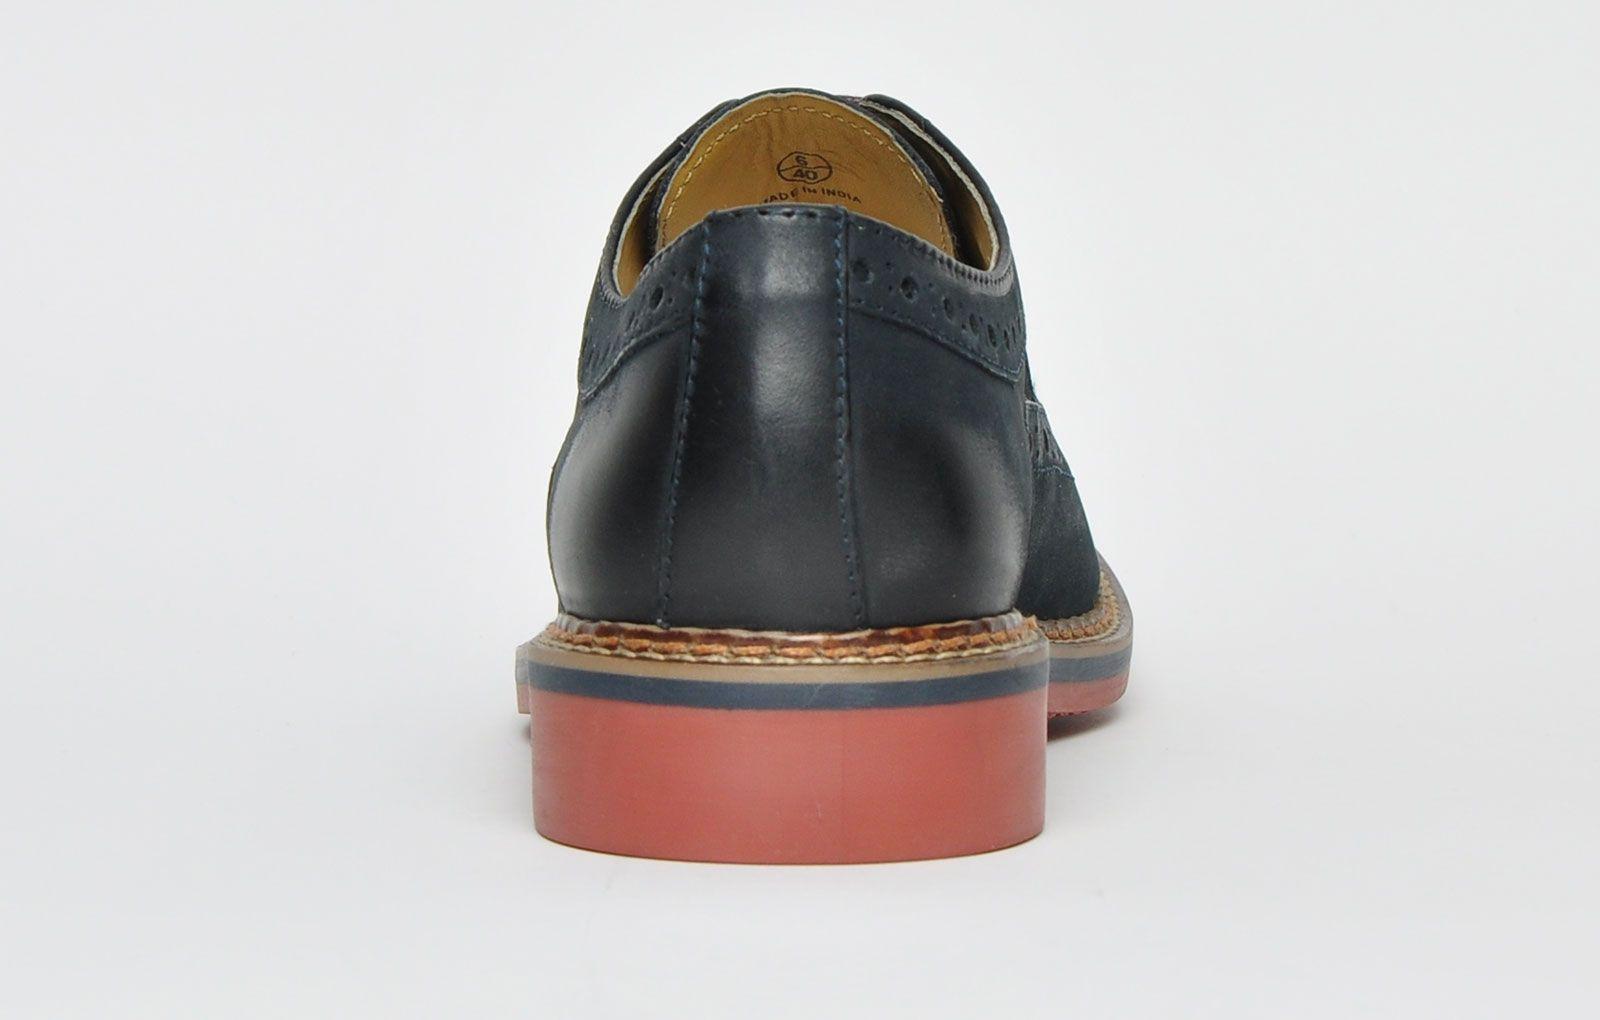 Ikon Classic Barley Leather Brogue Mens